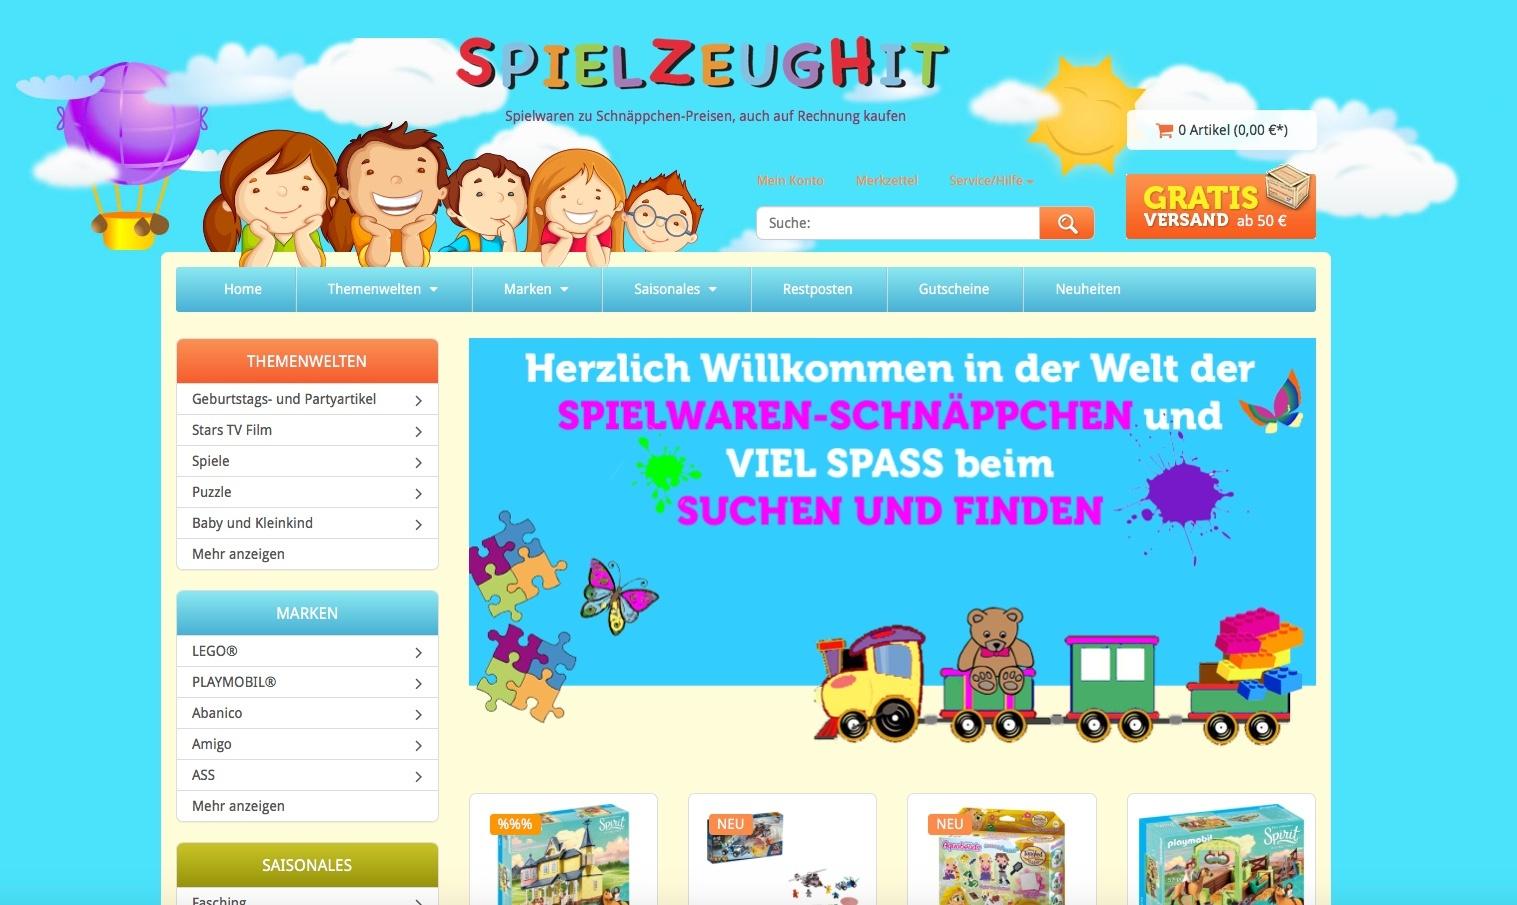 Spielzeughit.de gehört zu den Top 50 Online Shops!